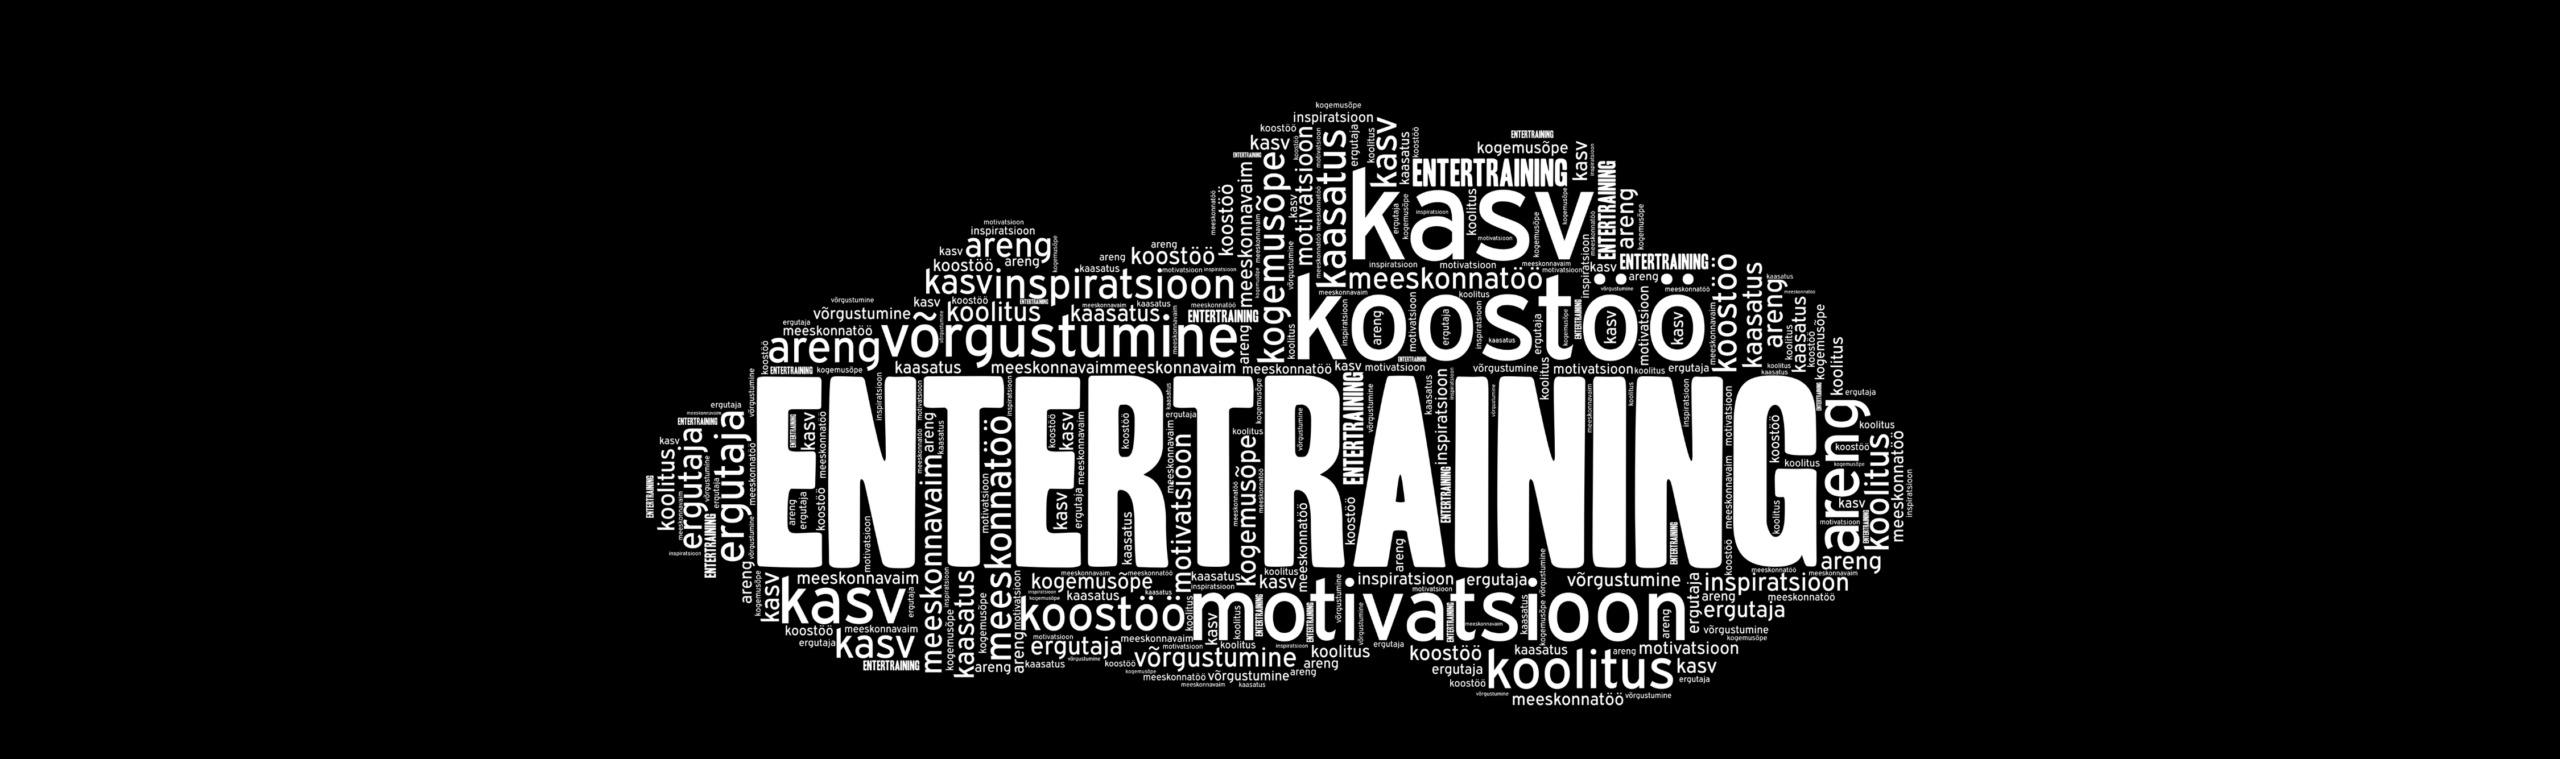 EnterTraining sõnapilv